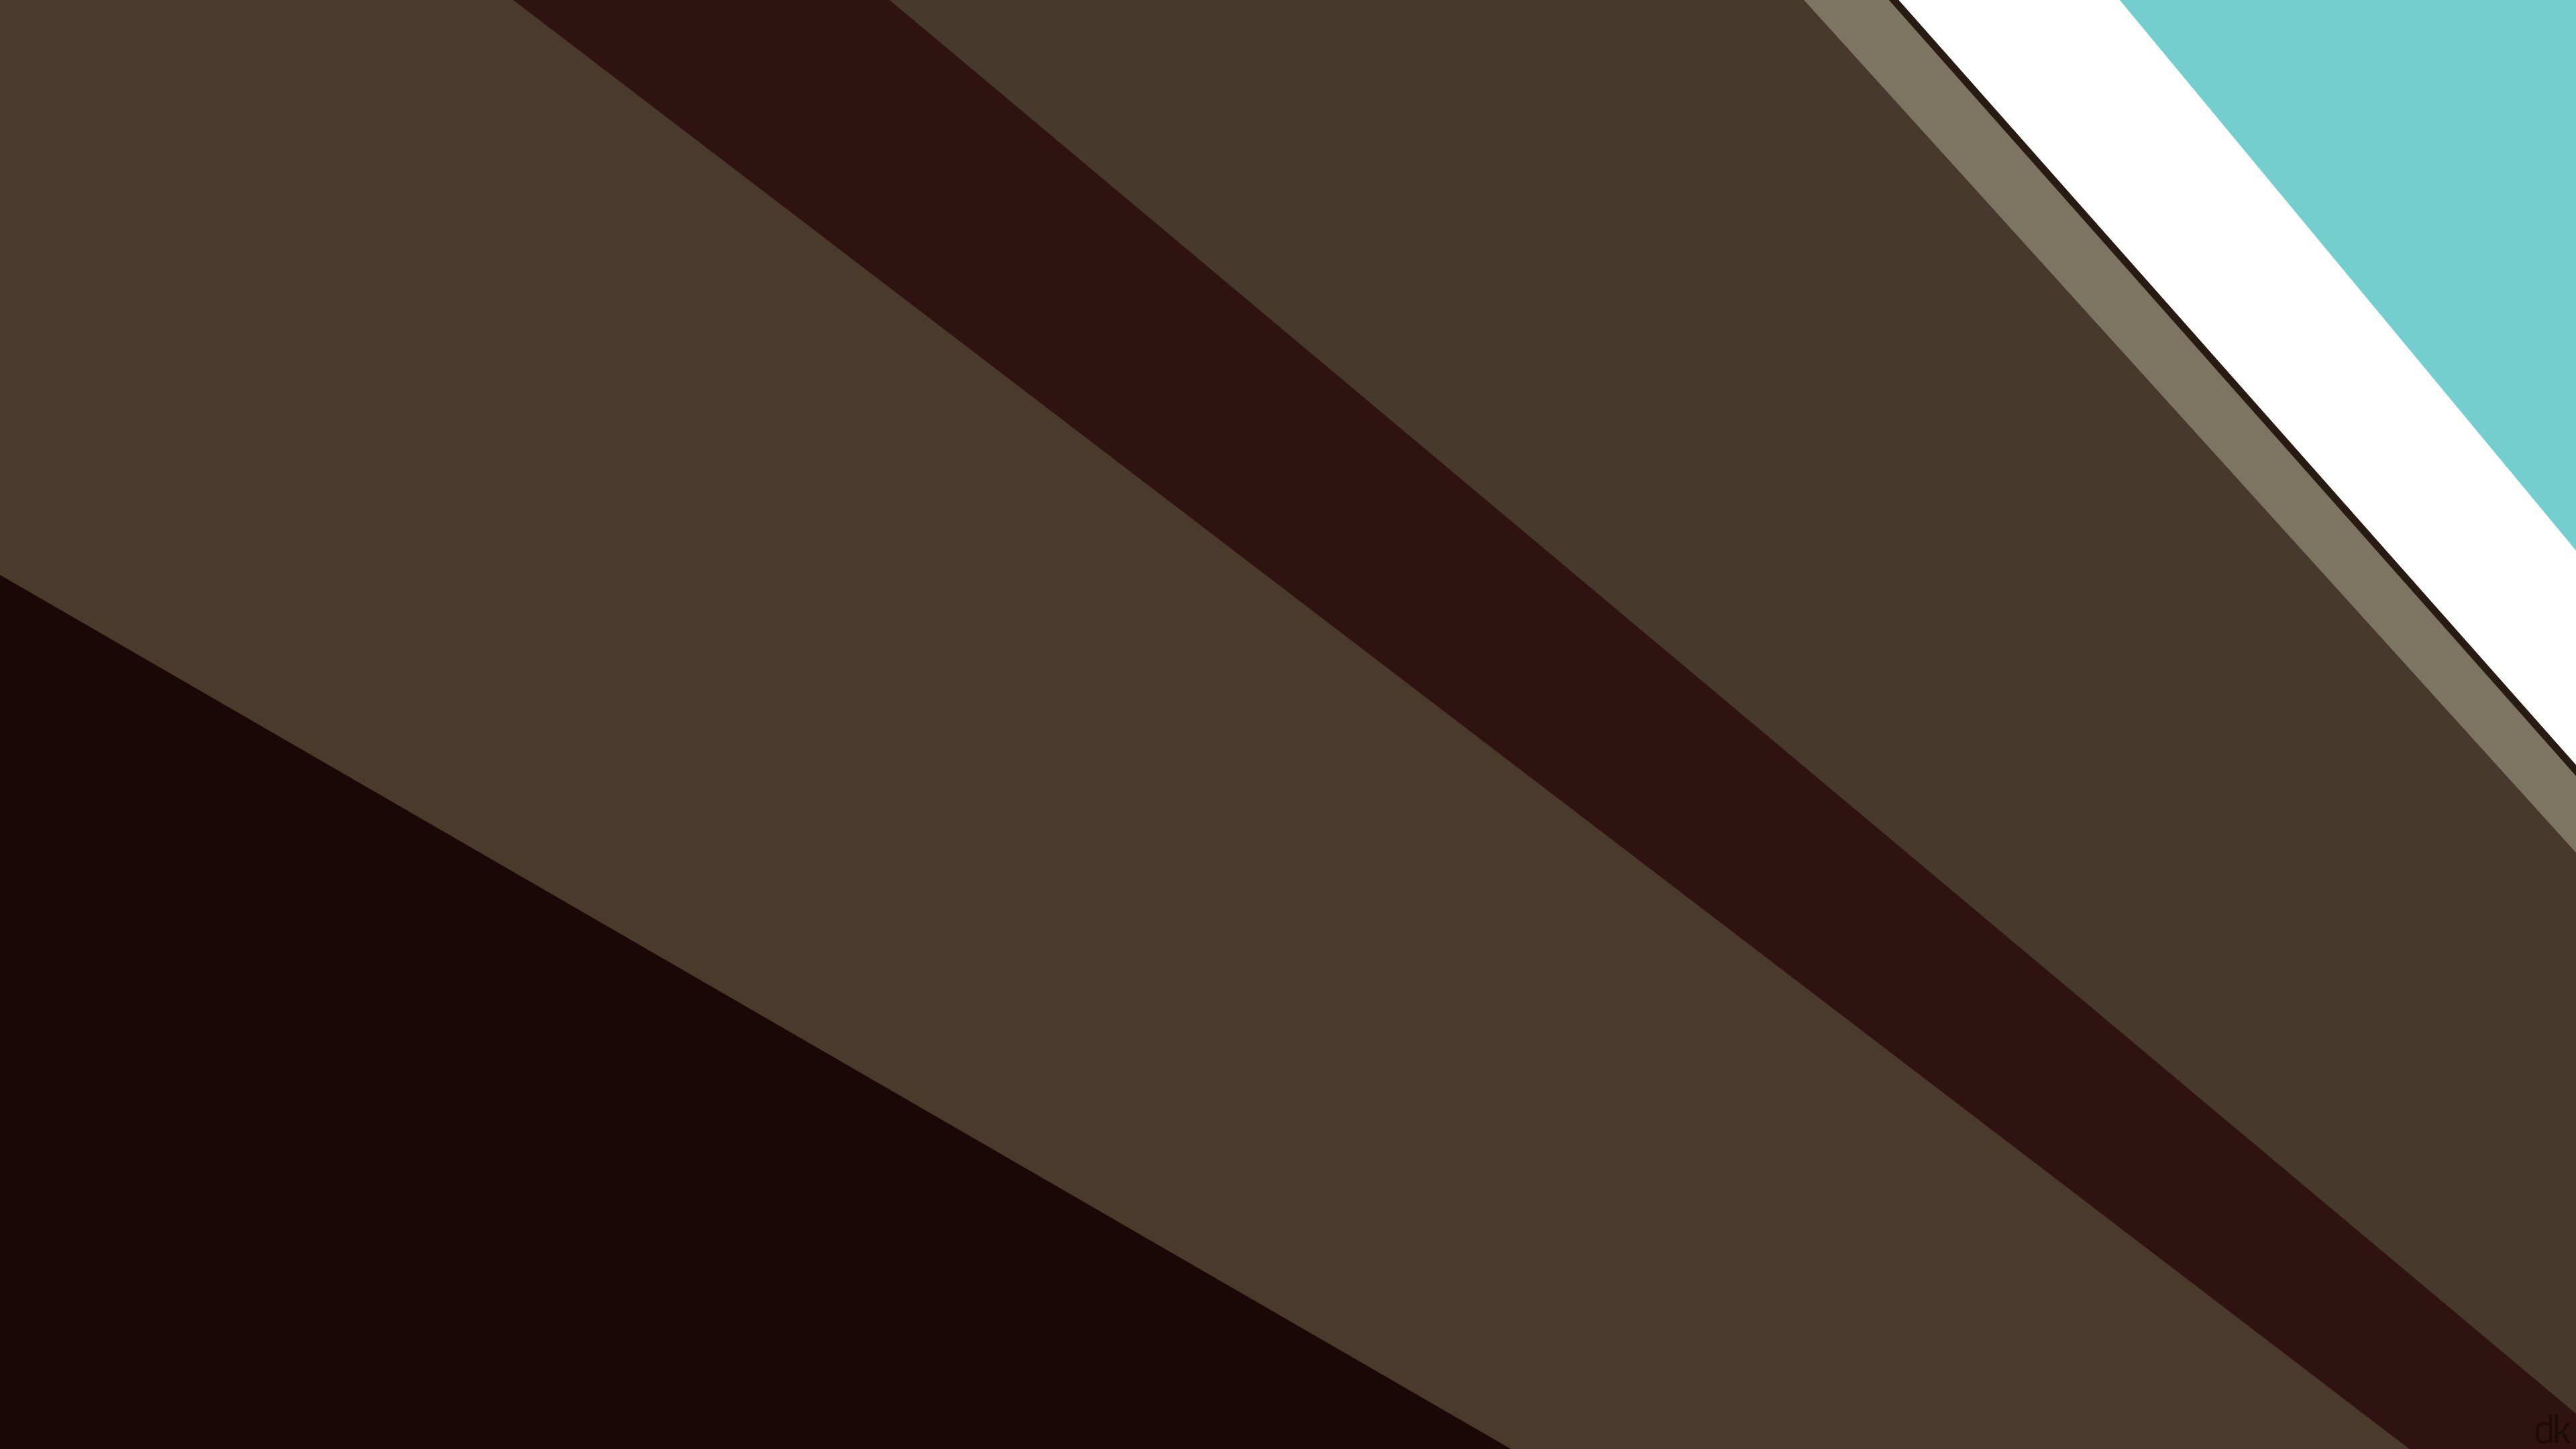 Minflat default android l wallpaper 4k by dakoder on for Material design wallpaper 4k